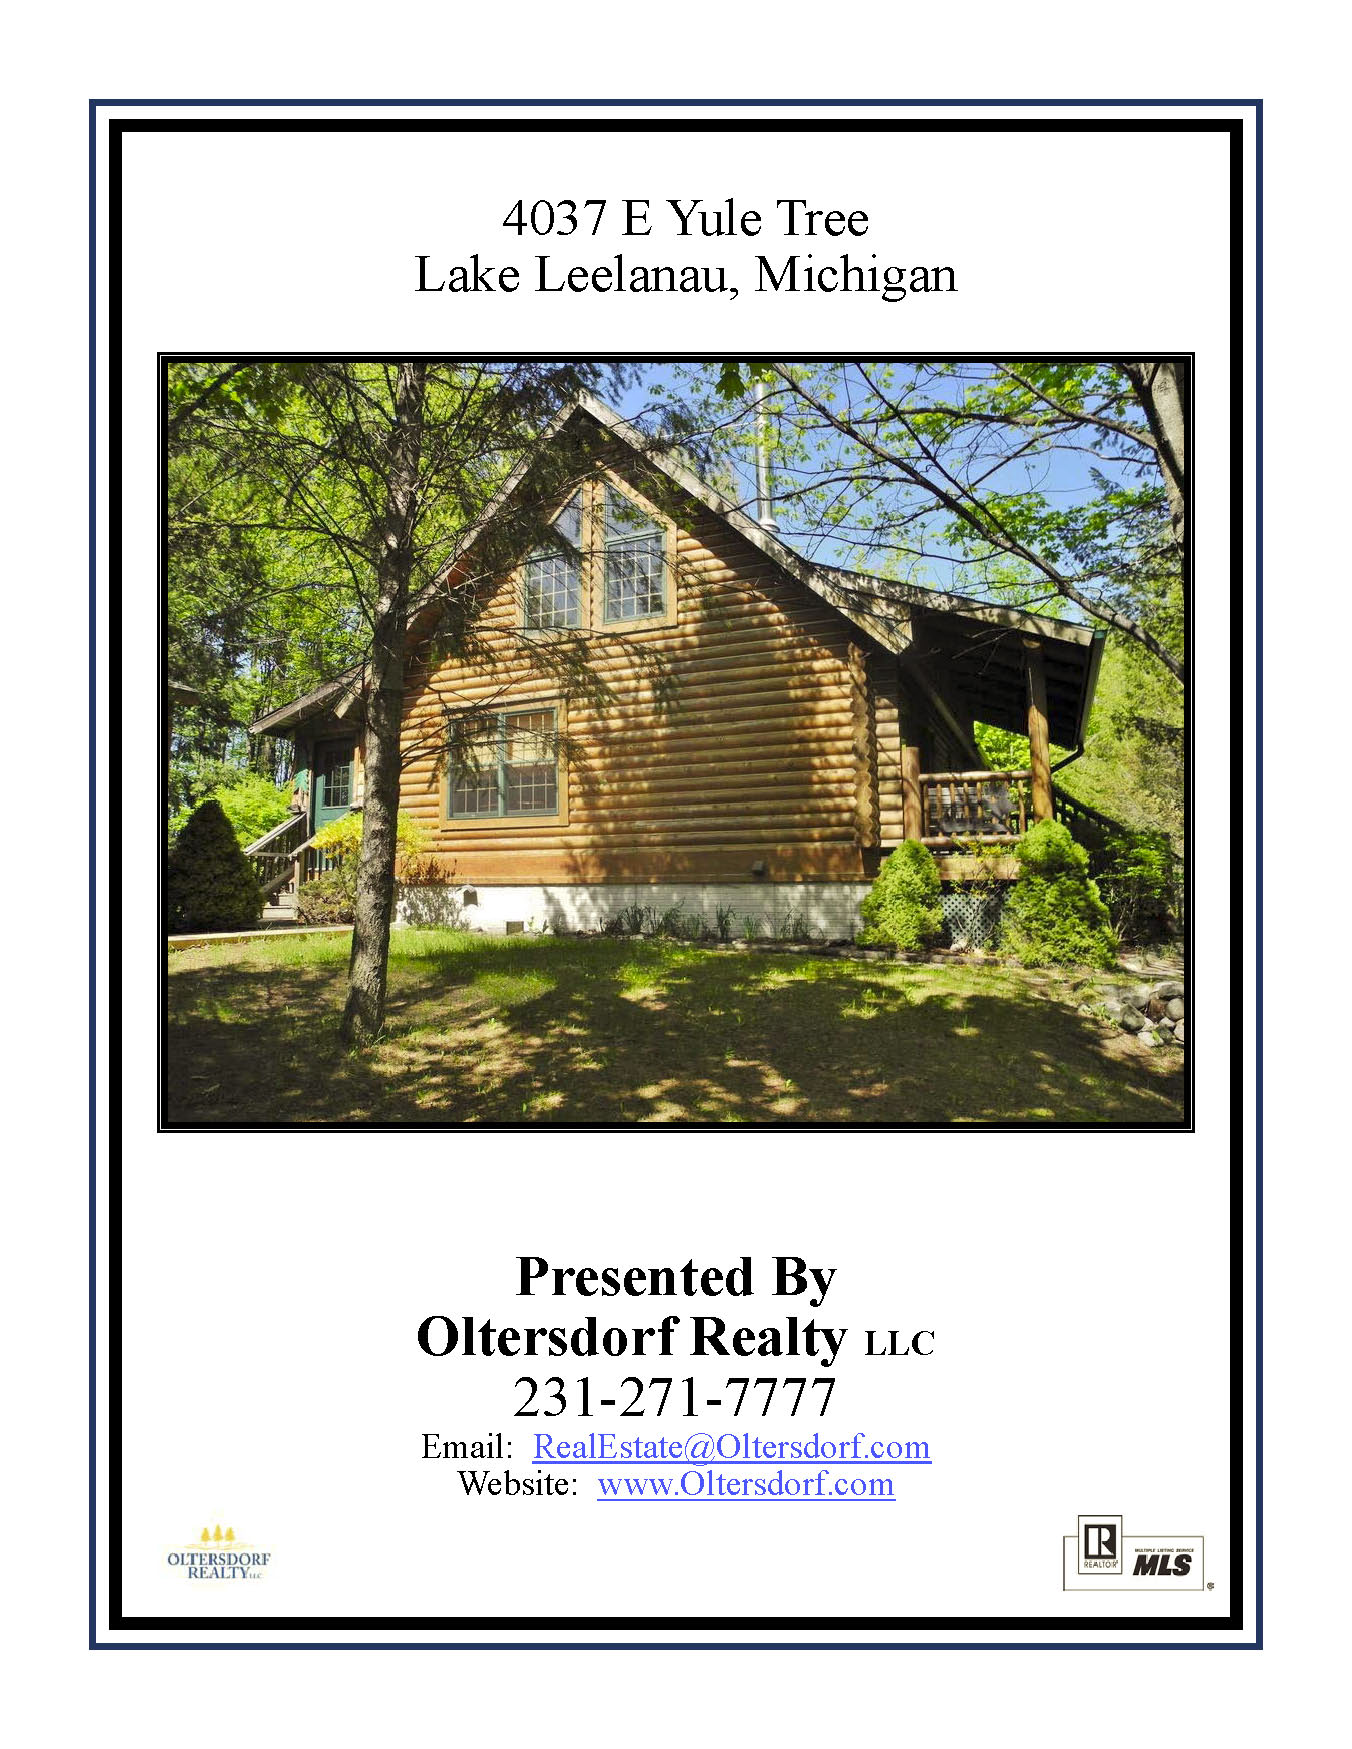 4037 E Yule Tree Lane, Lake Leelanau – FOR SALE by Oltersdorf Realty LLC - Marketing Packet (1).jpg